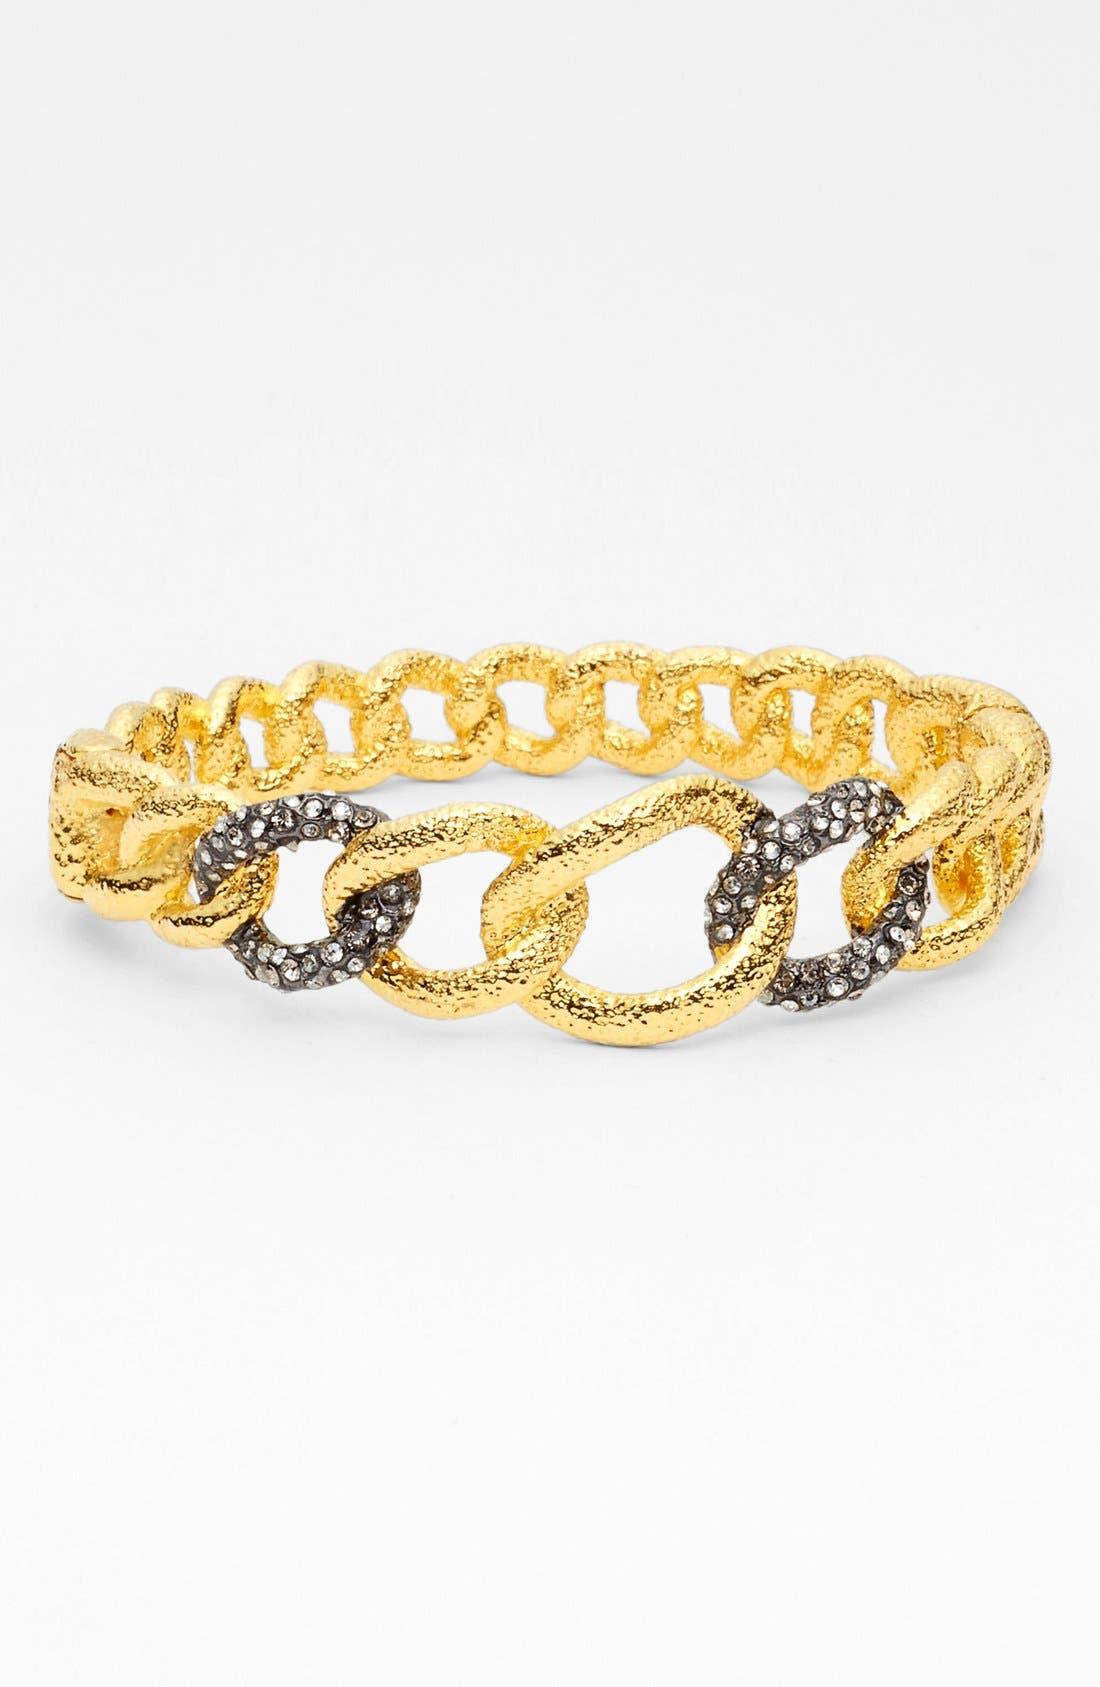 Alternate Image 1 Selected - Alexis Bittar 'Elements - Jardin de Papillon' Hinged Chain Link Bracelet